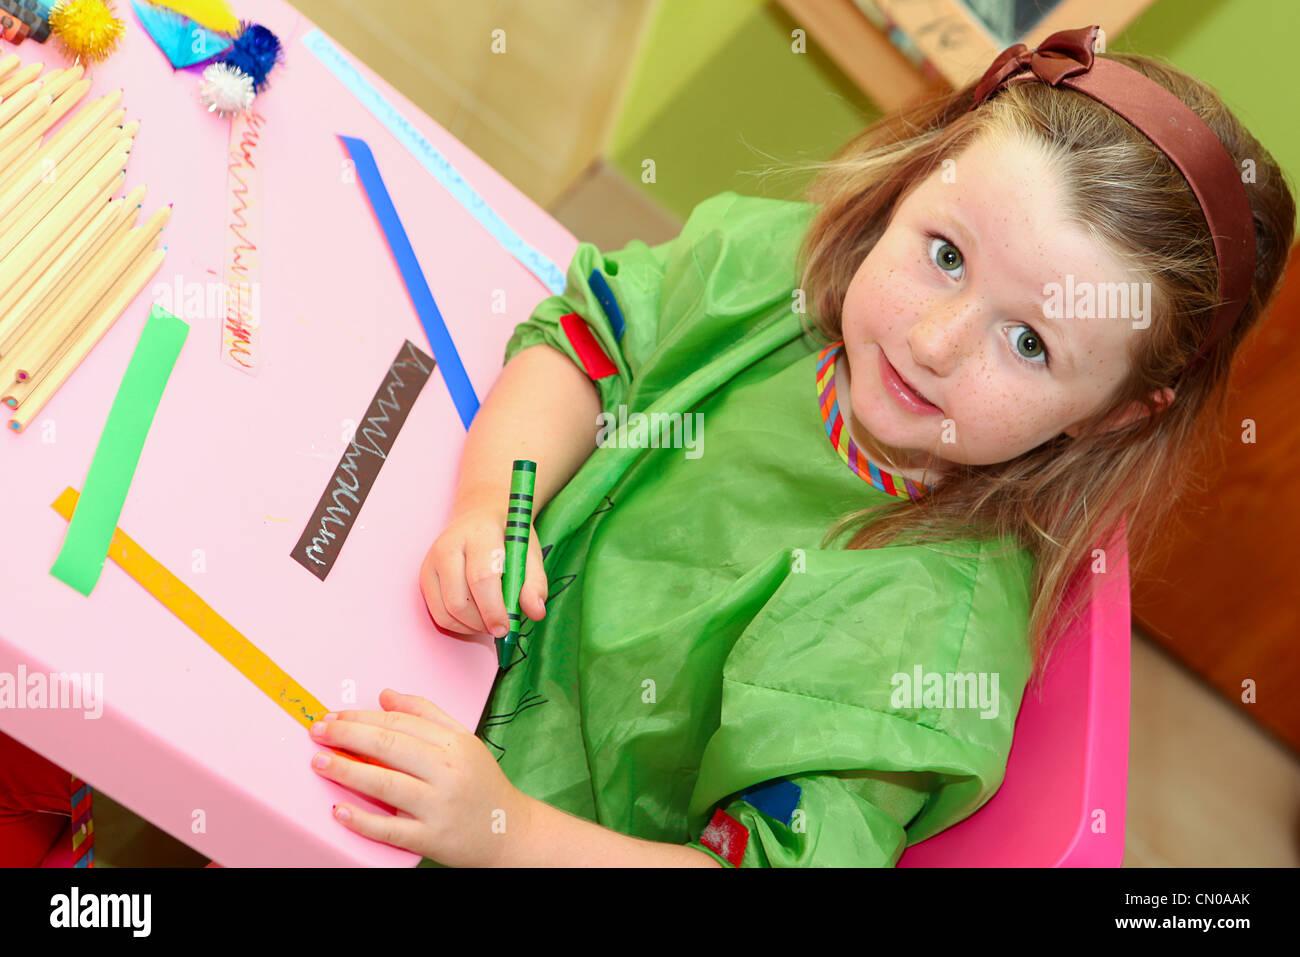 happy smiling kid drawing at home or school kindergarden or kindergarten - Stock Image